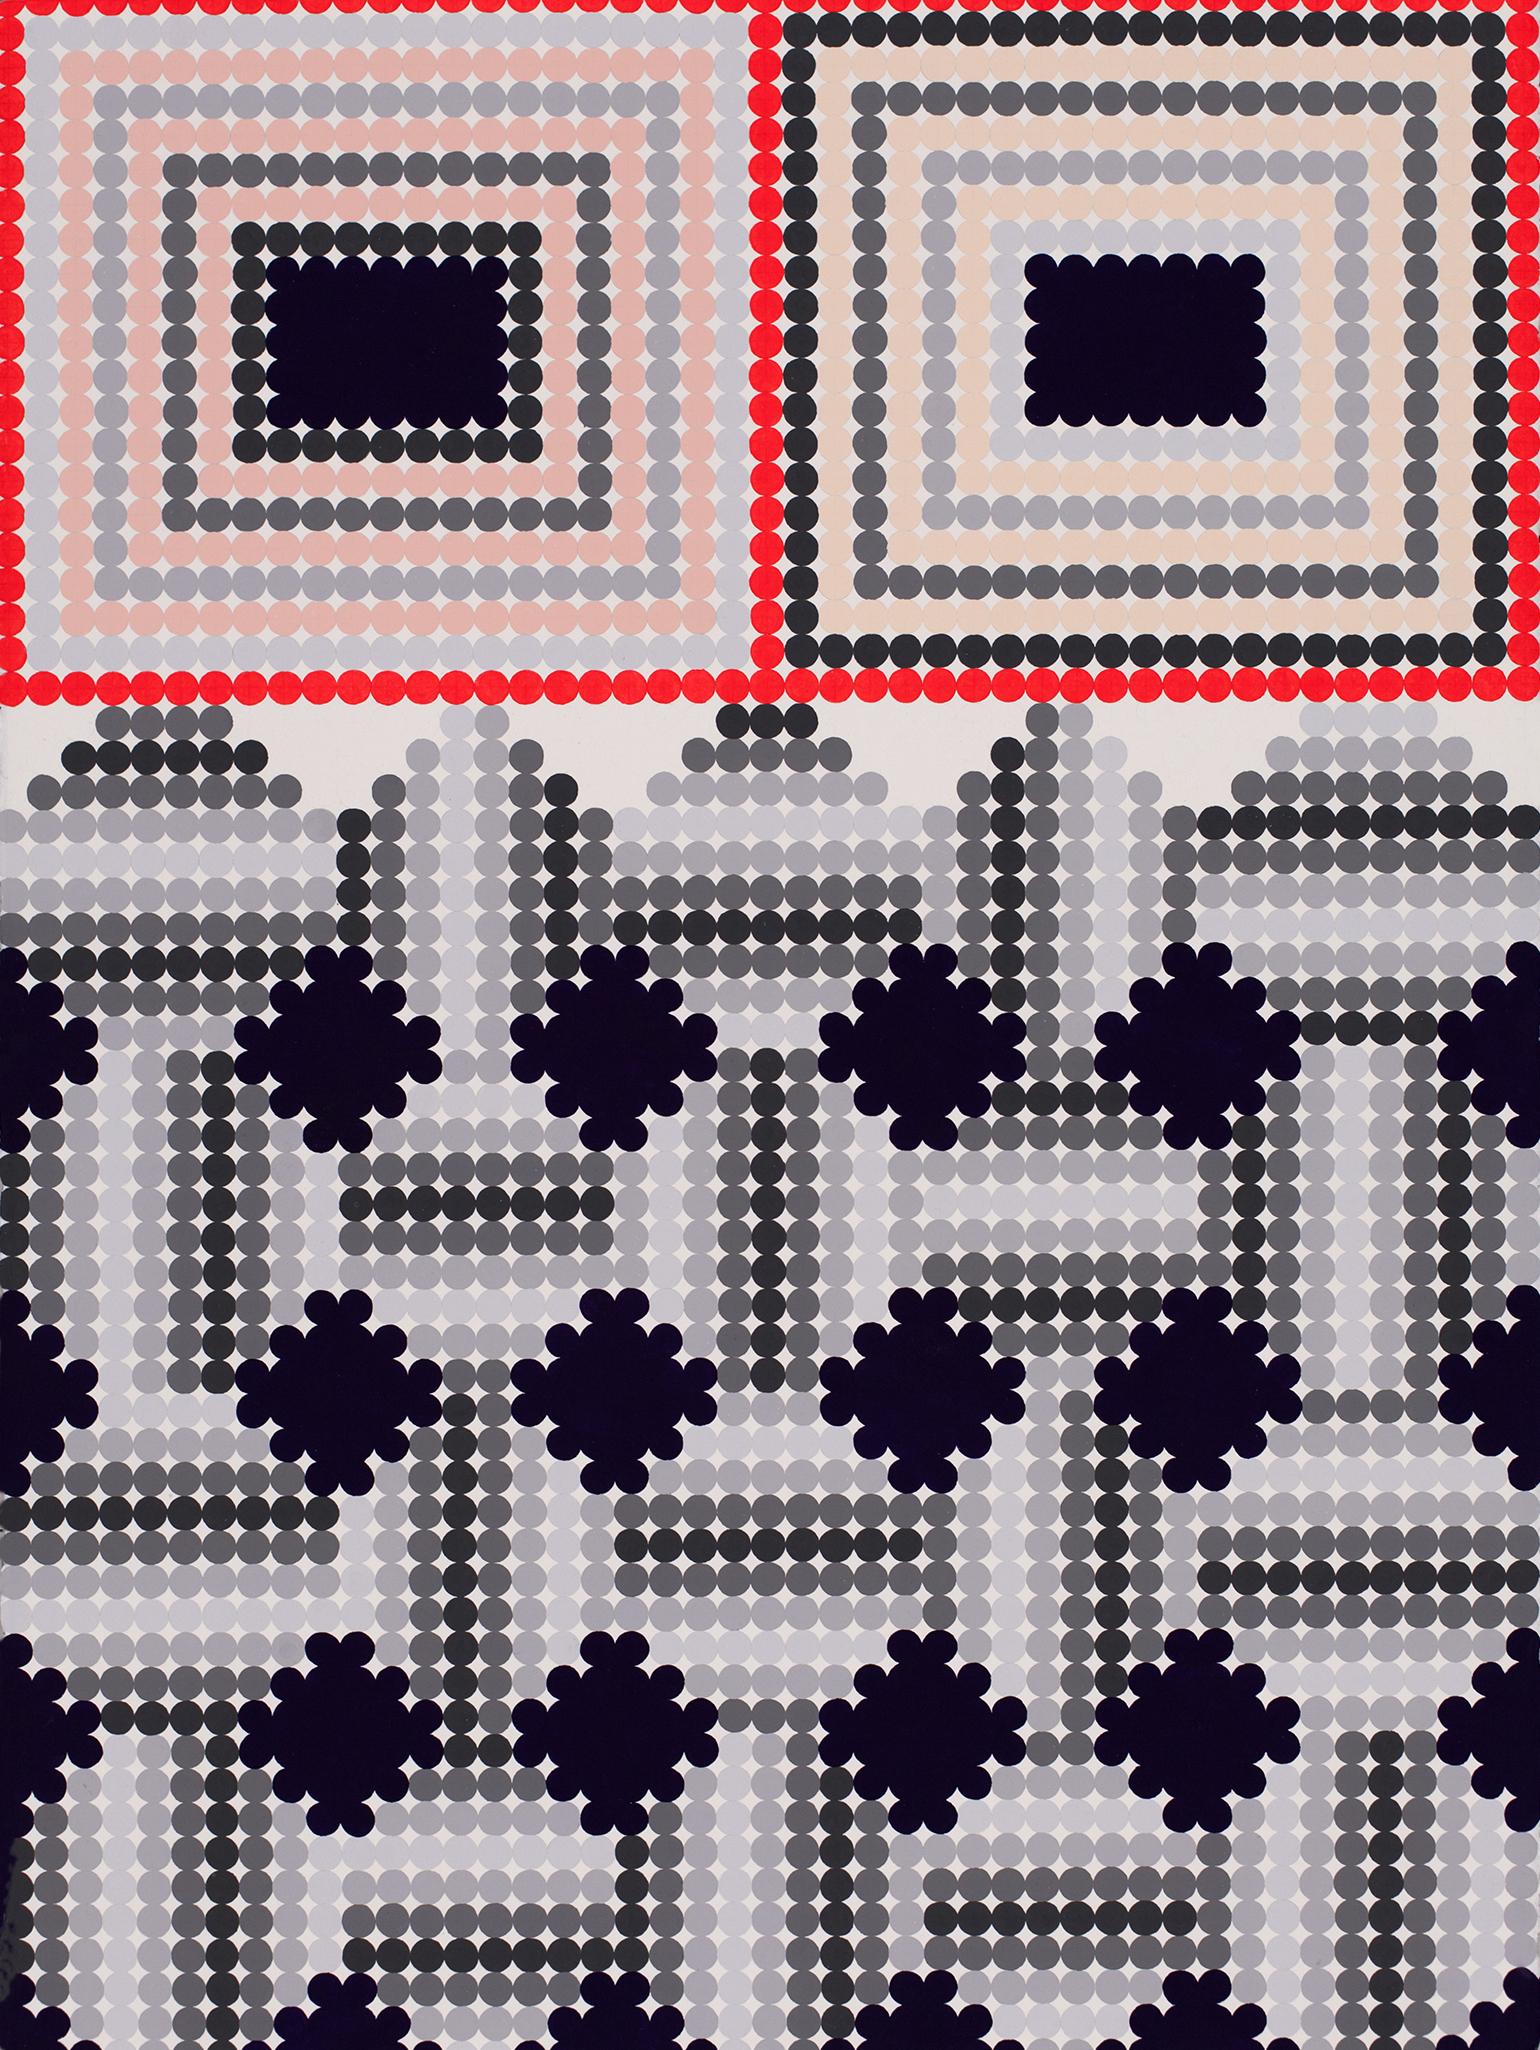 Double Penetration/ Twenty Fades Of Gray, 2015